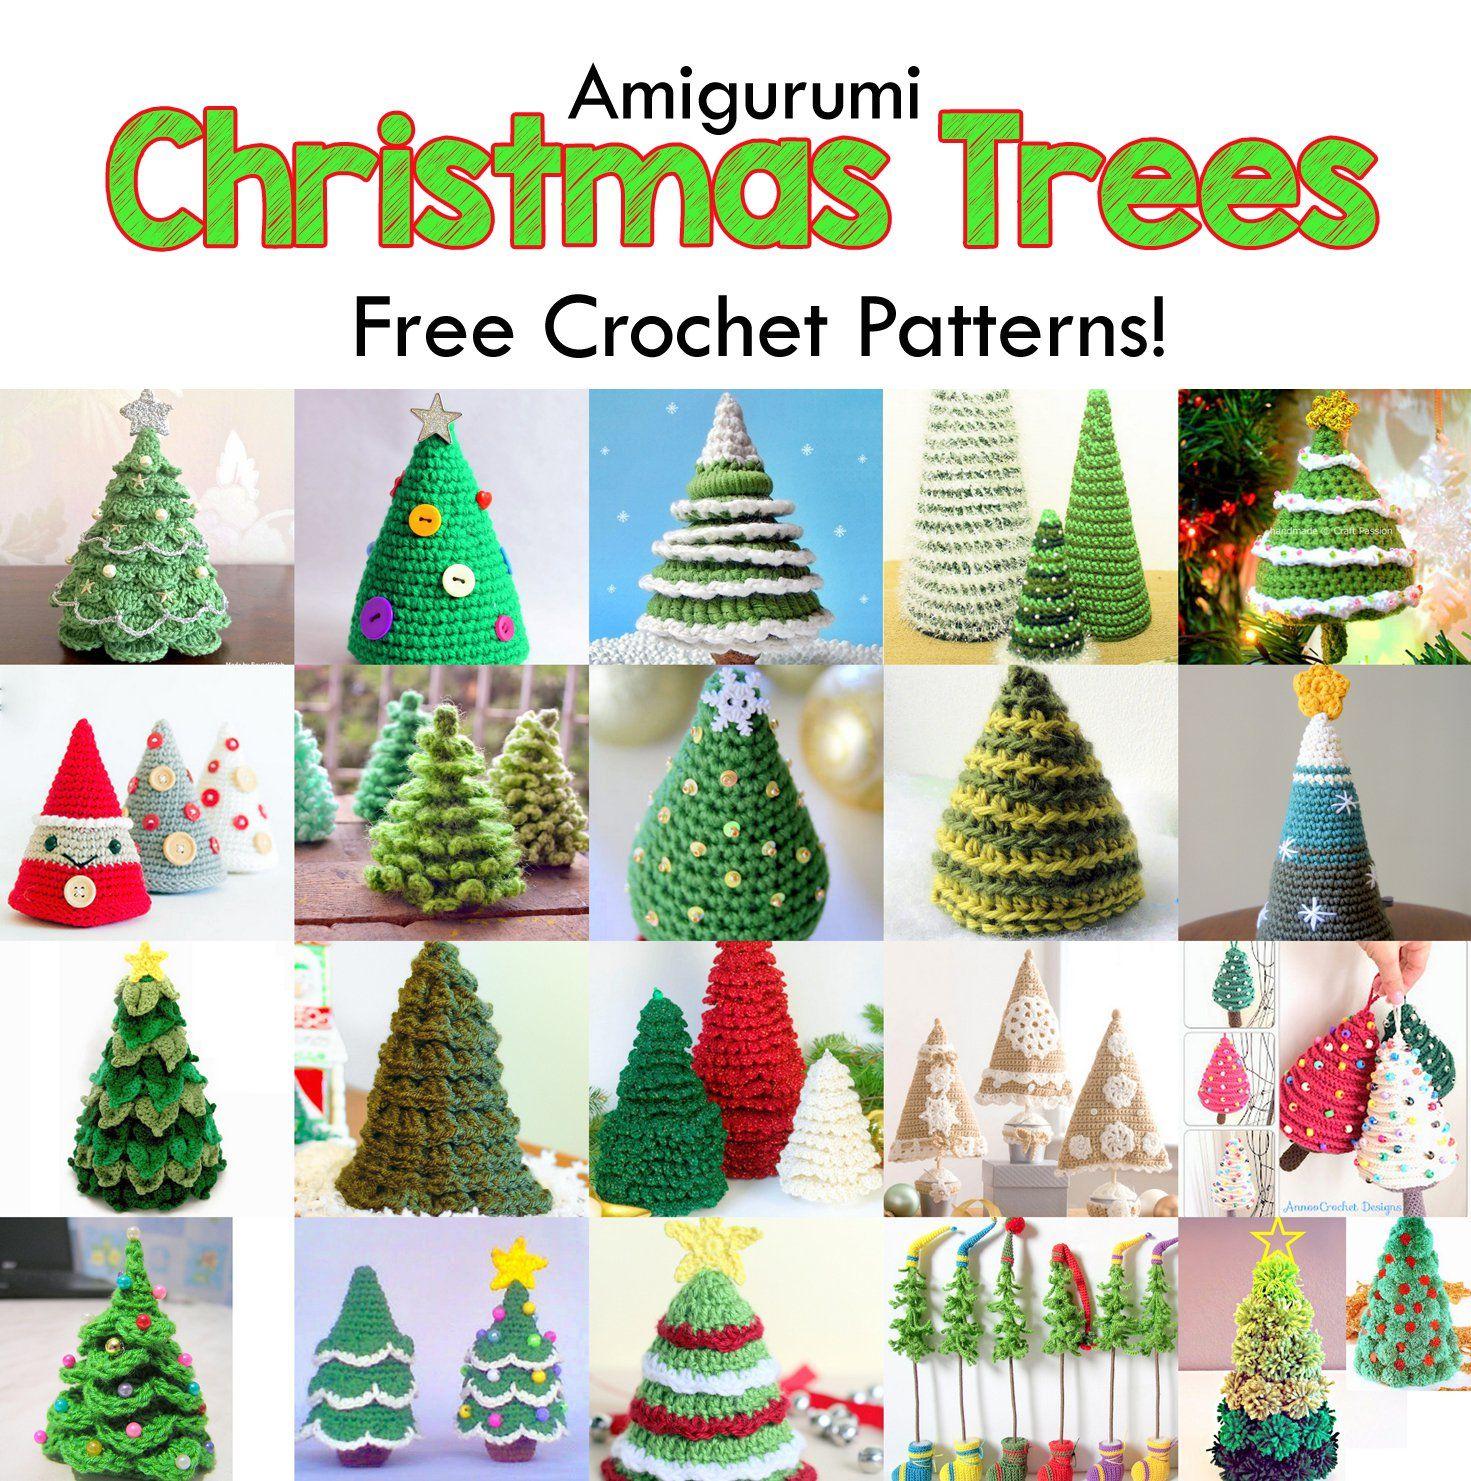 19 Free Amigurumi Christmas Tree Crochet Patterns